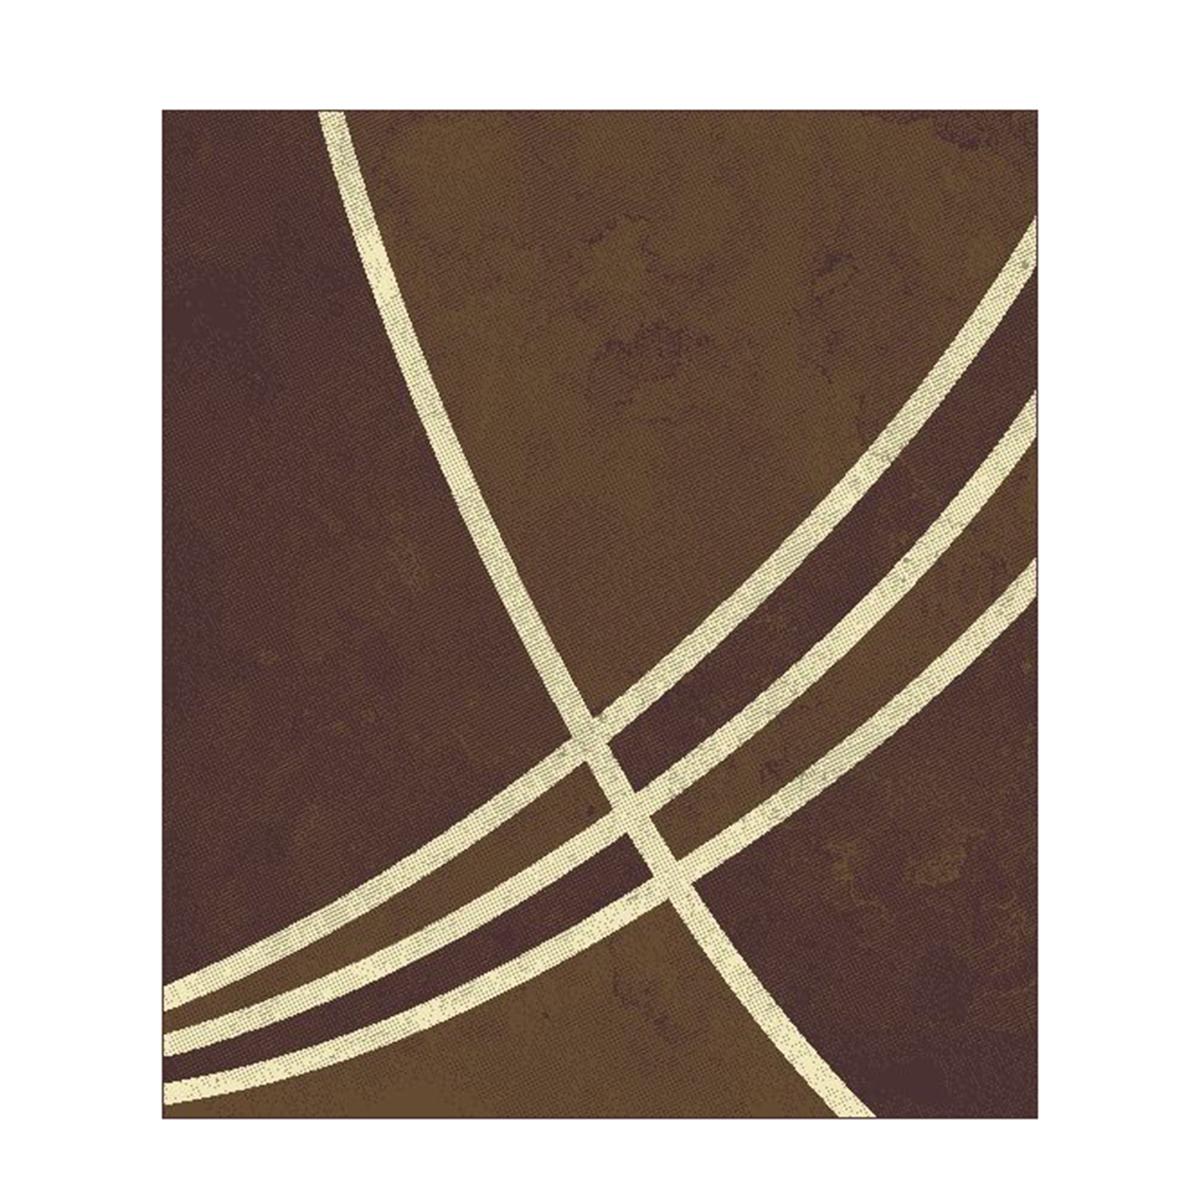 килим Lanu линии кафяв